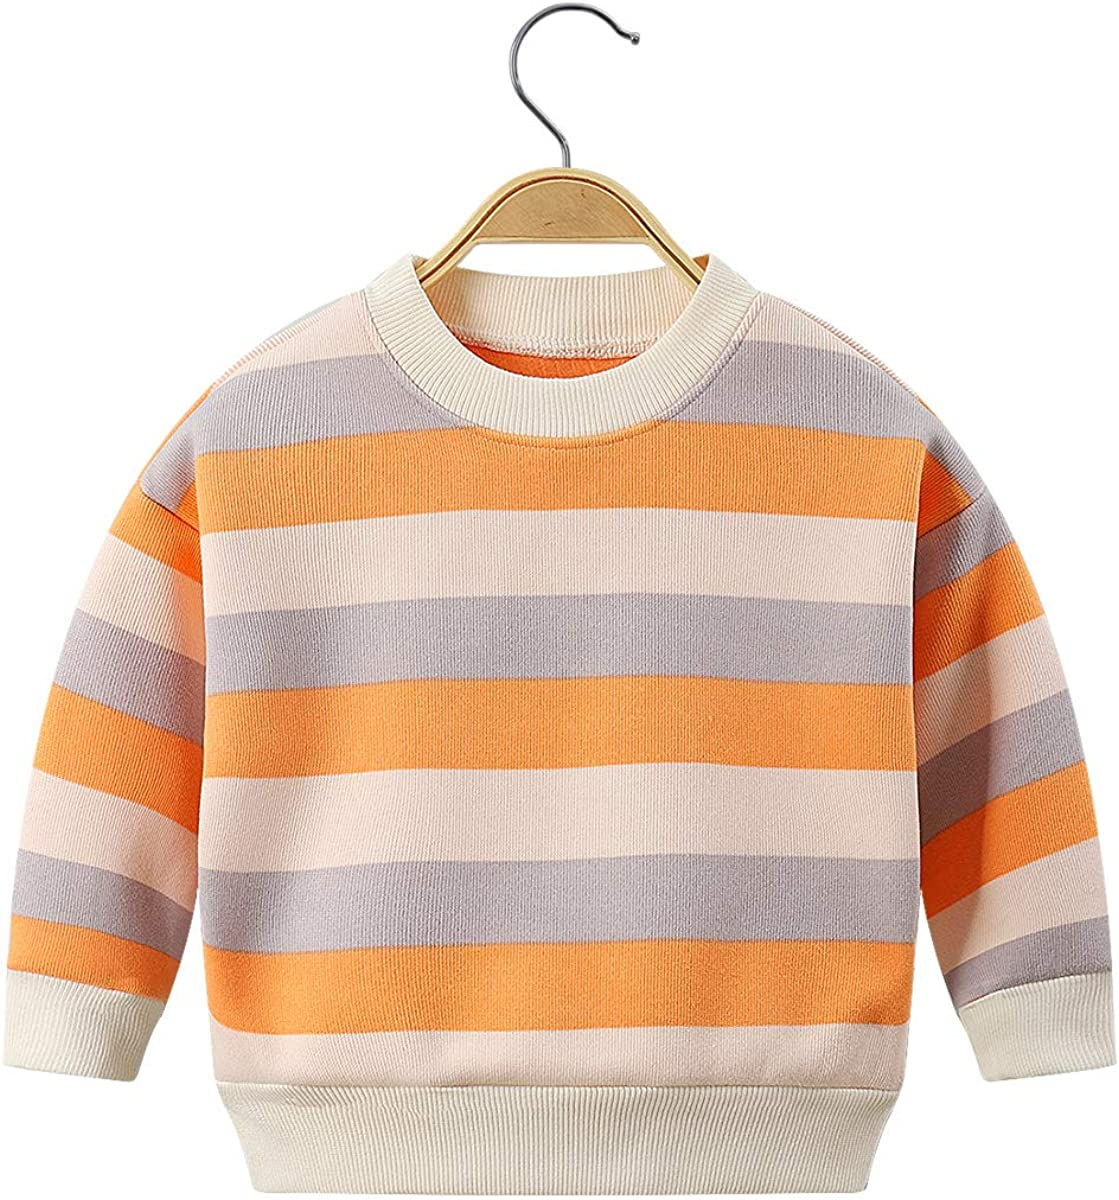 Ctskyte Toddler Unisex Kids Fleece Long Sleeve Pullover Sweatshirt Stripes Kids Crew-Neck Sweater